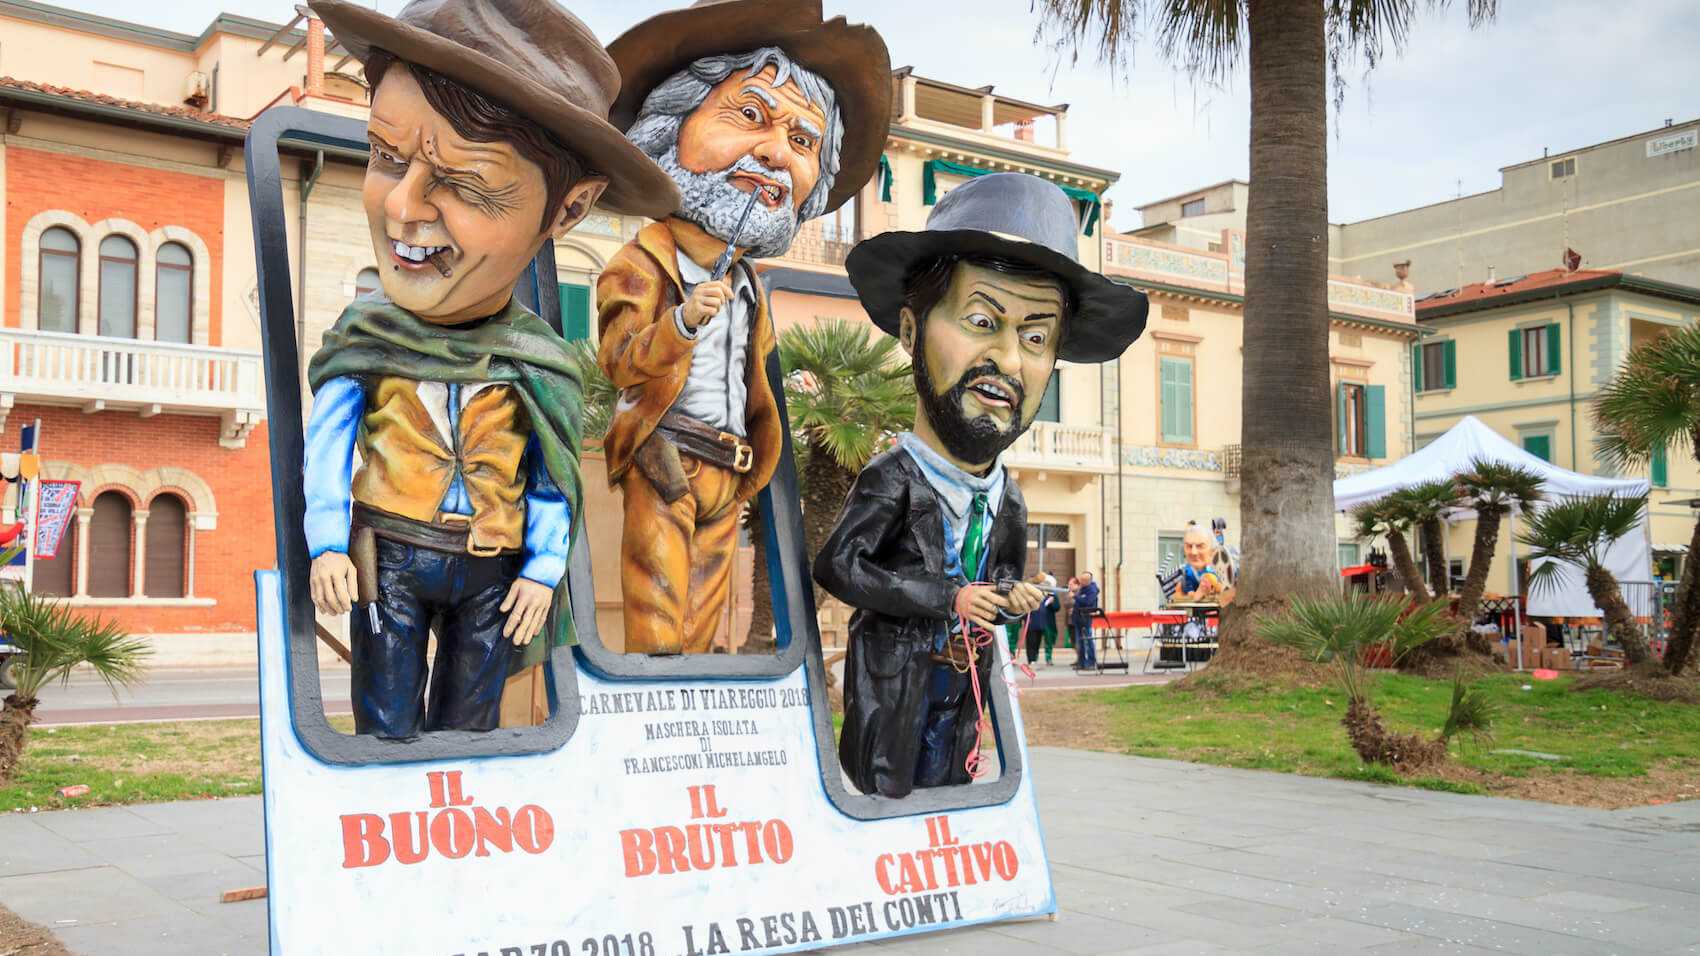 Caricature of Italian politicians Beppe Grillo, Matteo Renzi and Matteo Salvini in carnival parade of floats and masks, on January 2018 in Viareggio, Tuscany, Italy. Photo: Kokophotos.